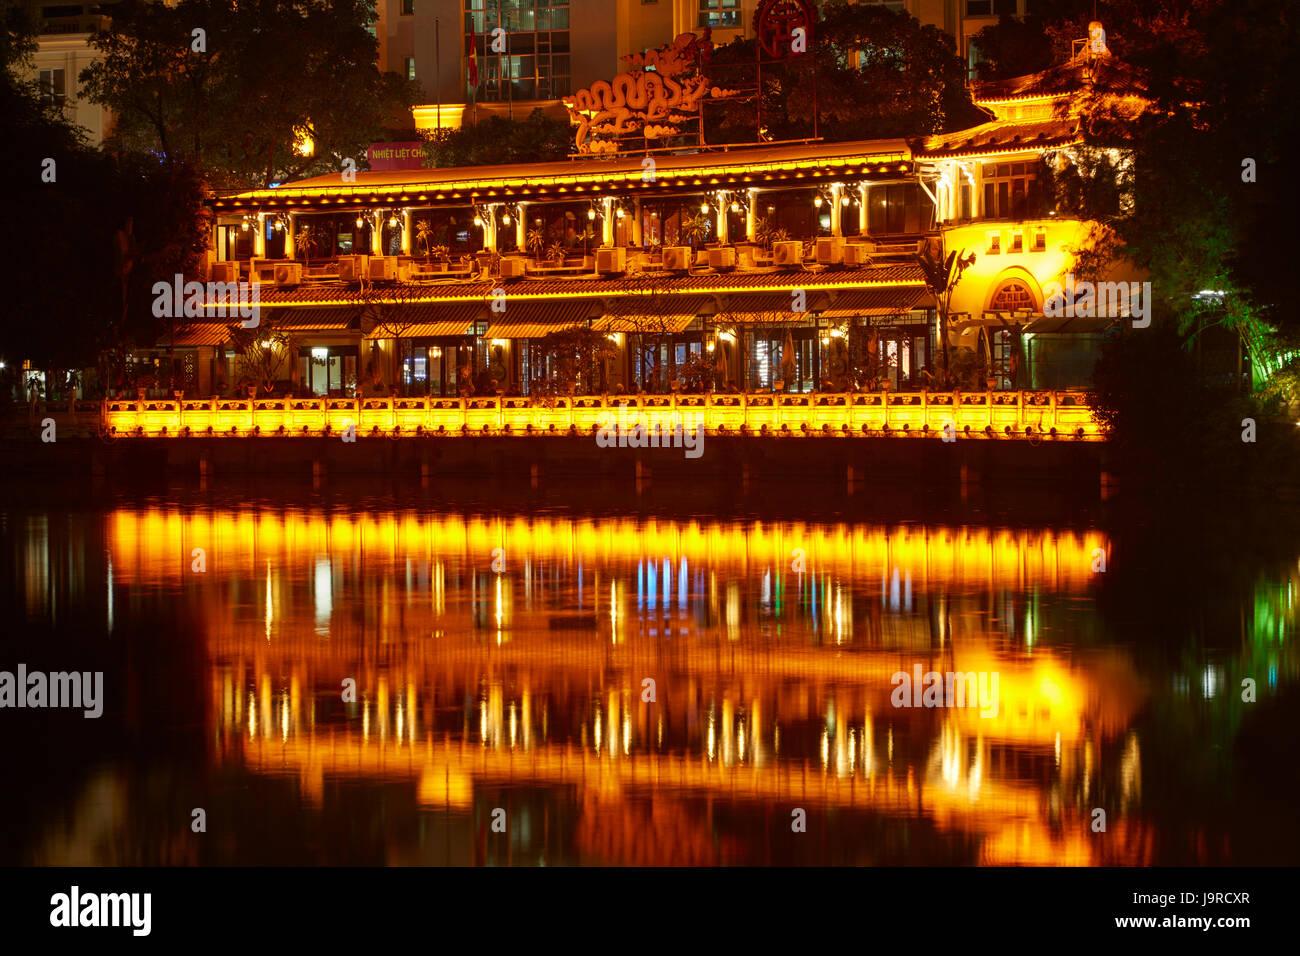 Restaurant reflected in Hoan Kiem Lake at night, Hanoi, Vietnam - Stock Image